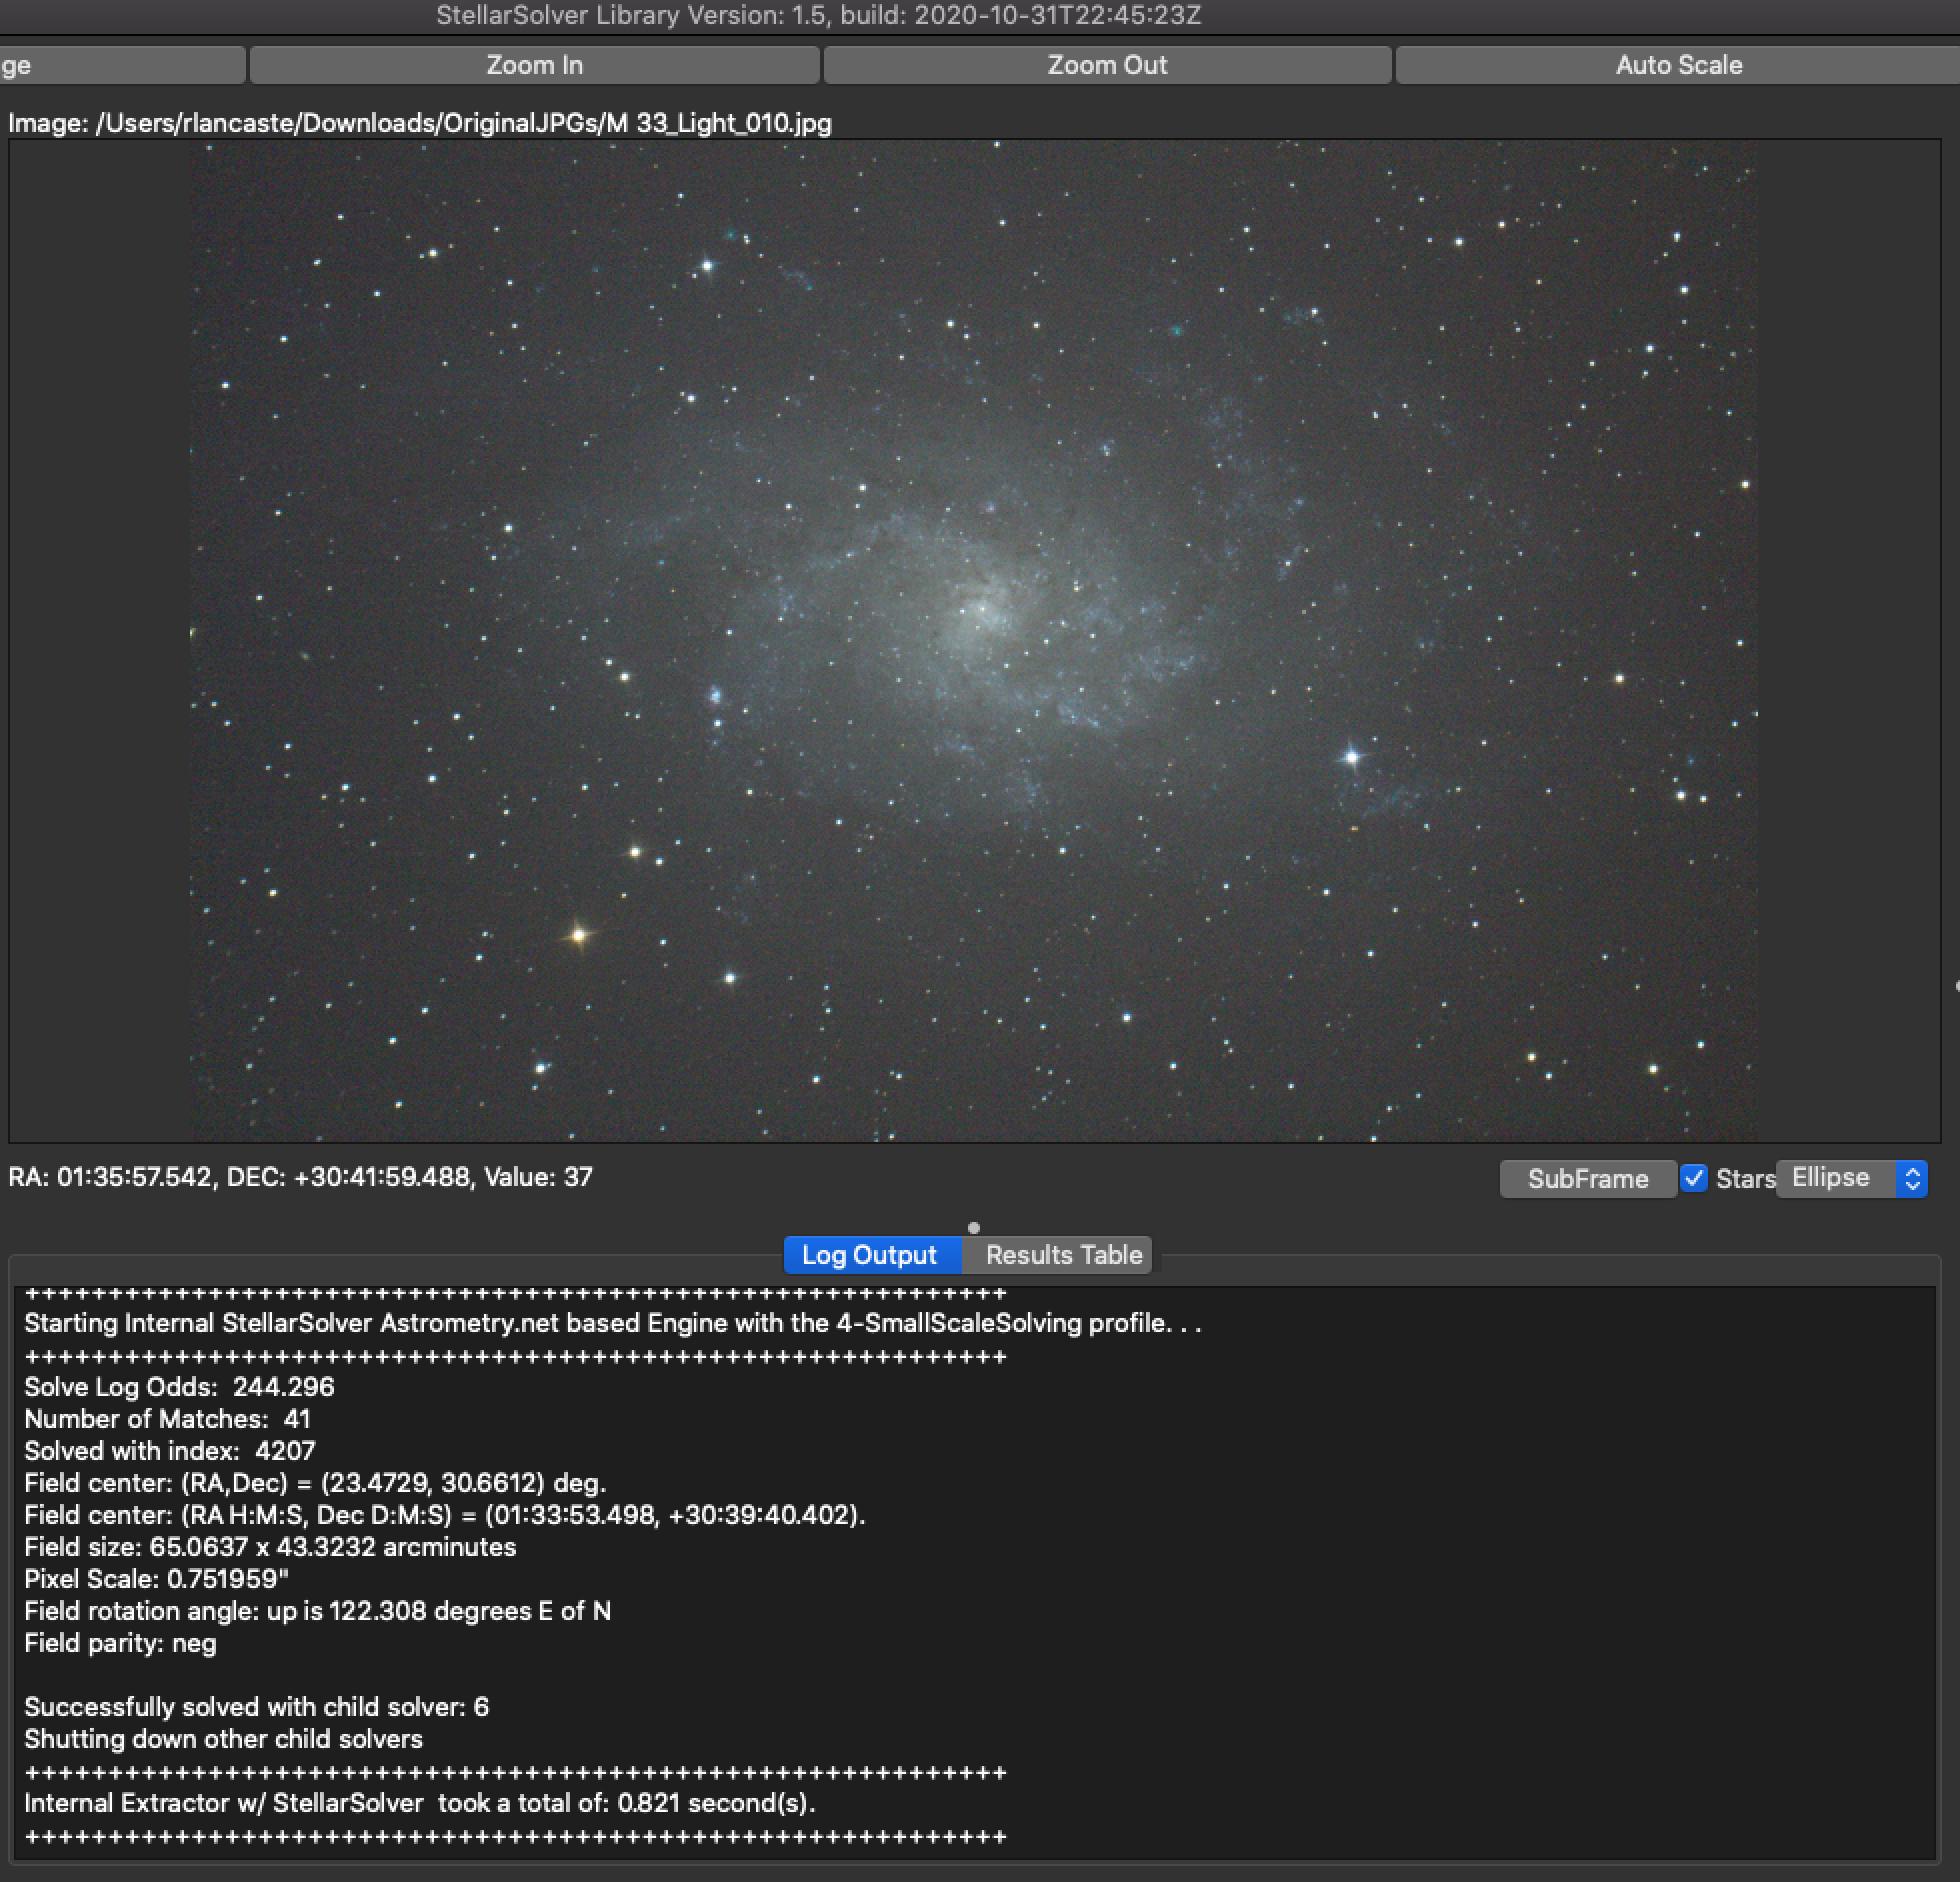 ScreenShot2020-11-01at11.46.27PM.png